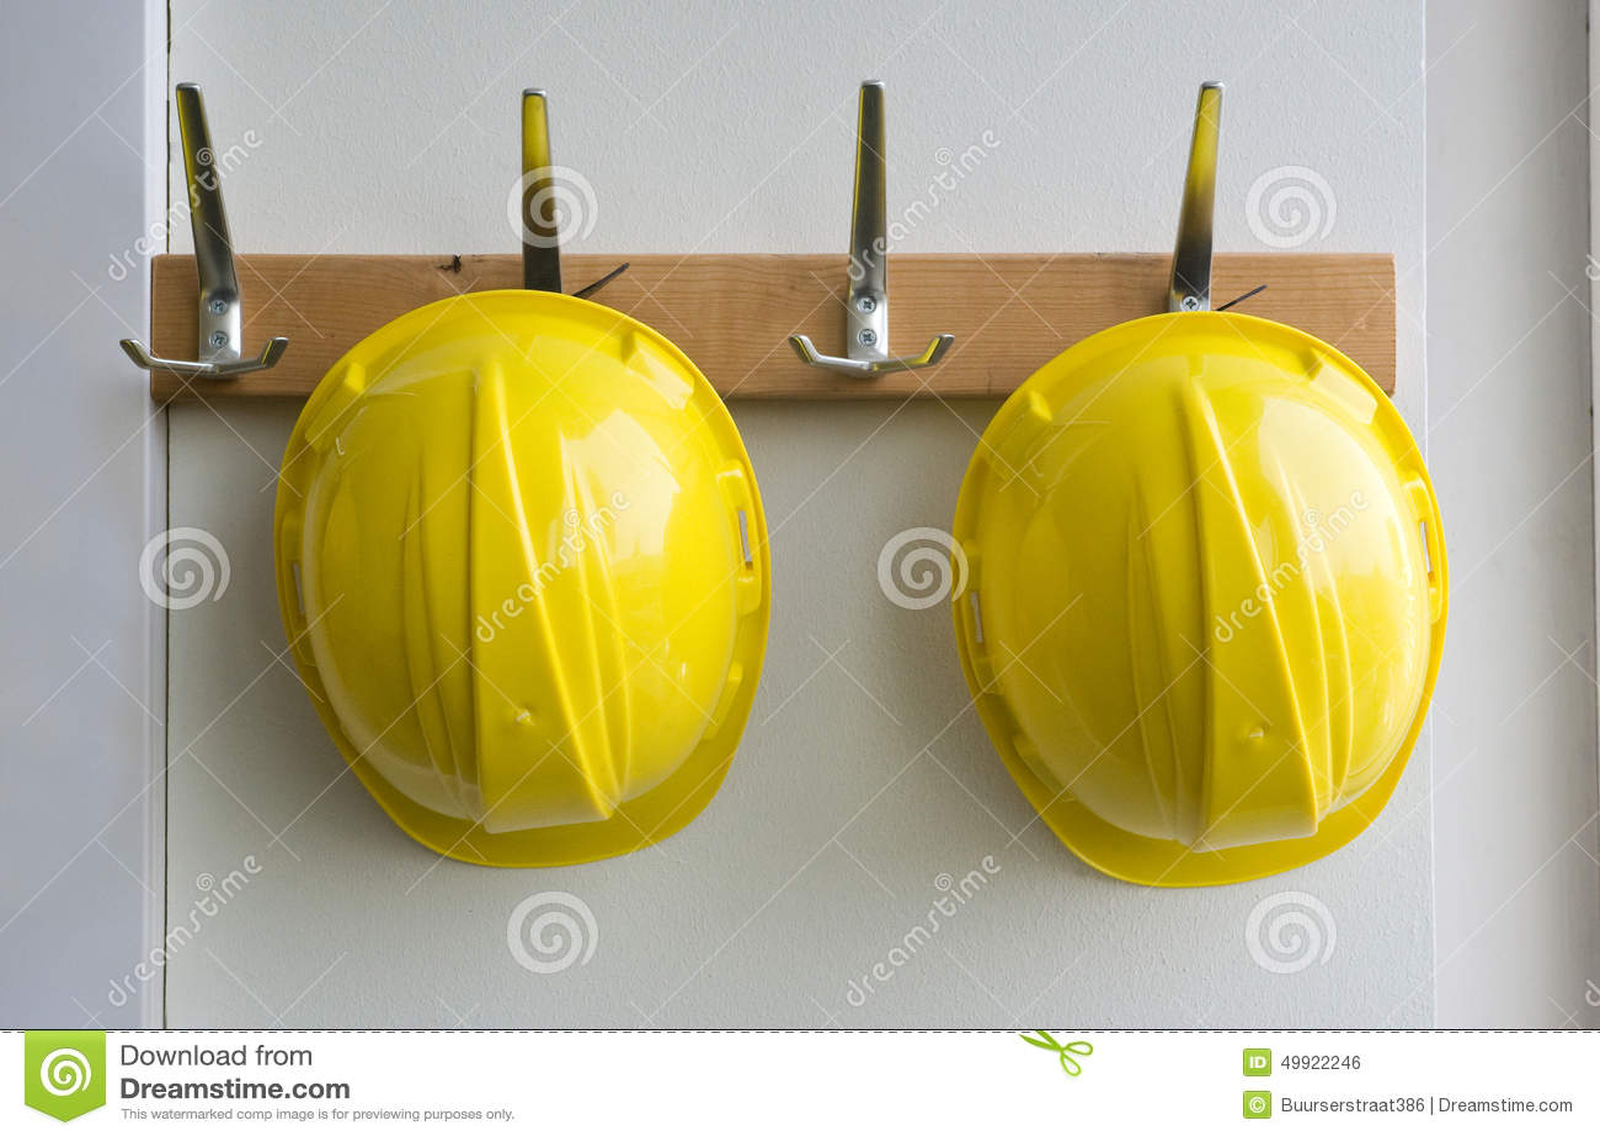 Helmets On Coat Hangers Stock Photo Image Of Occupation